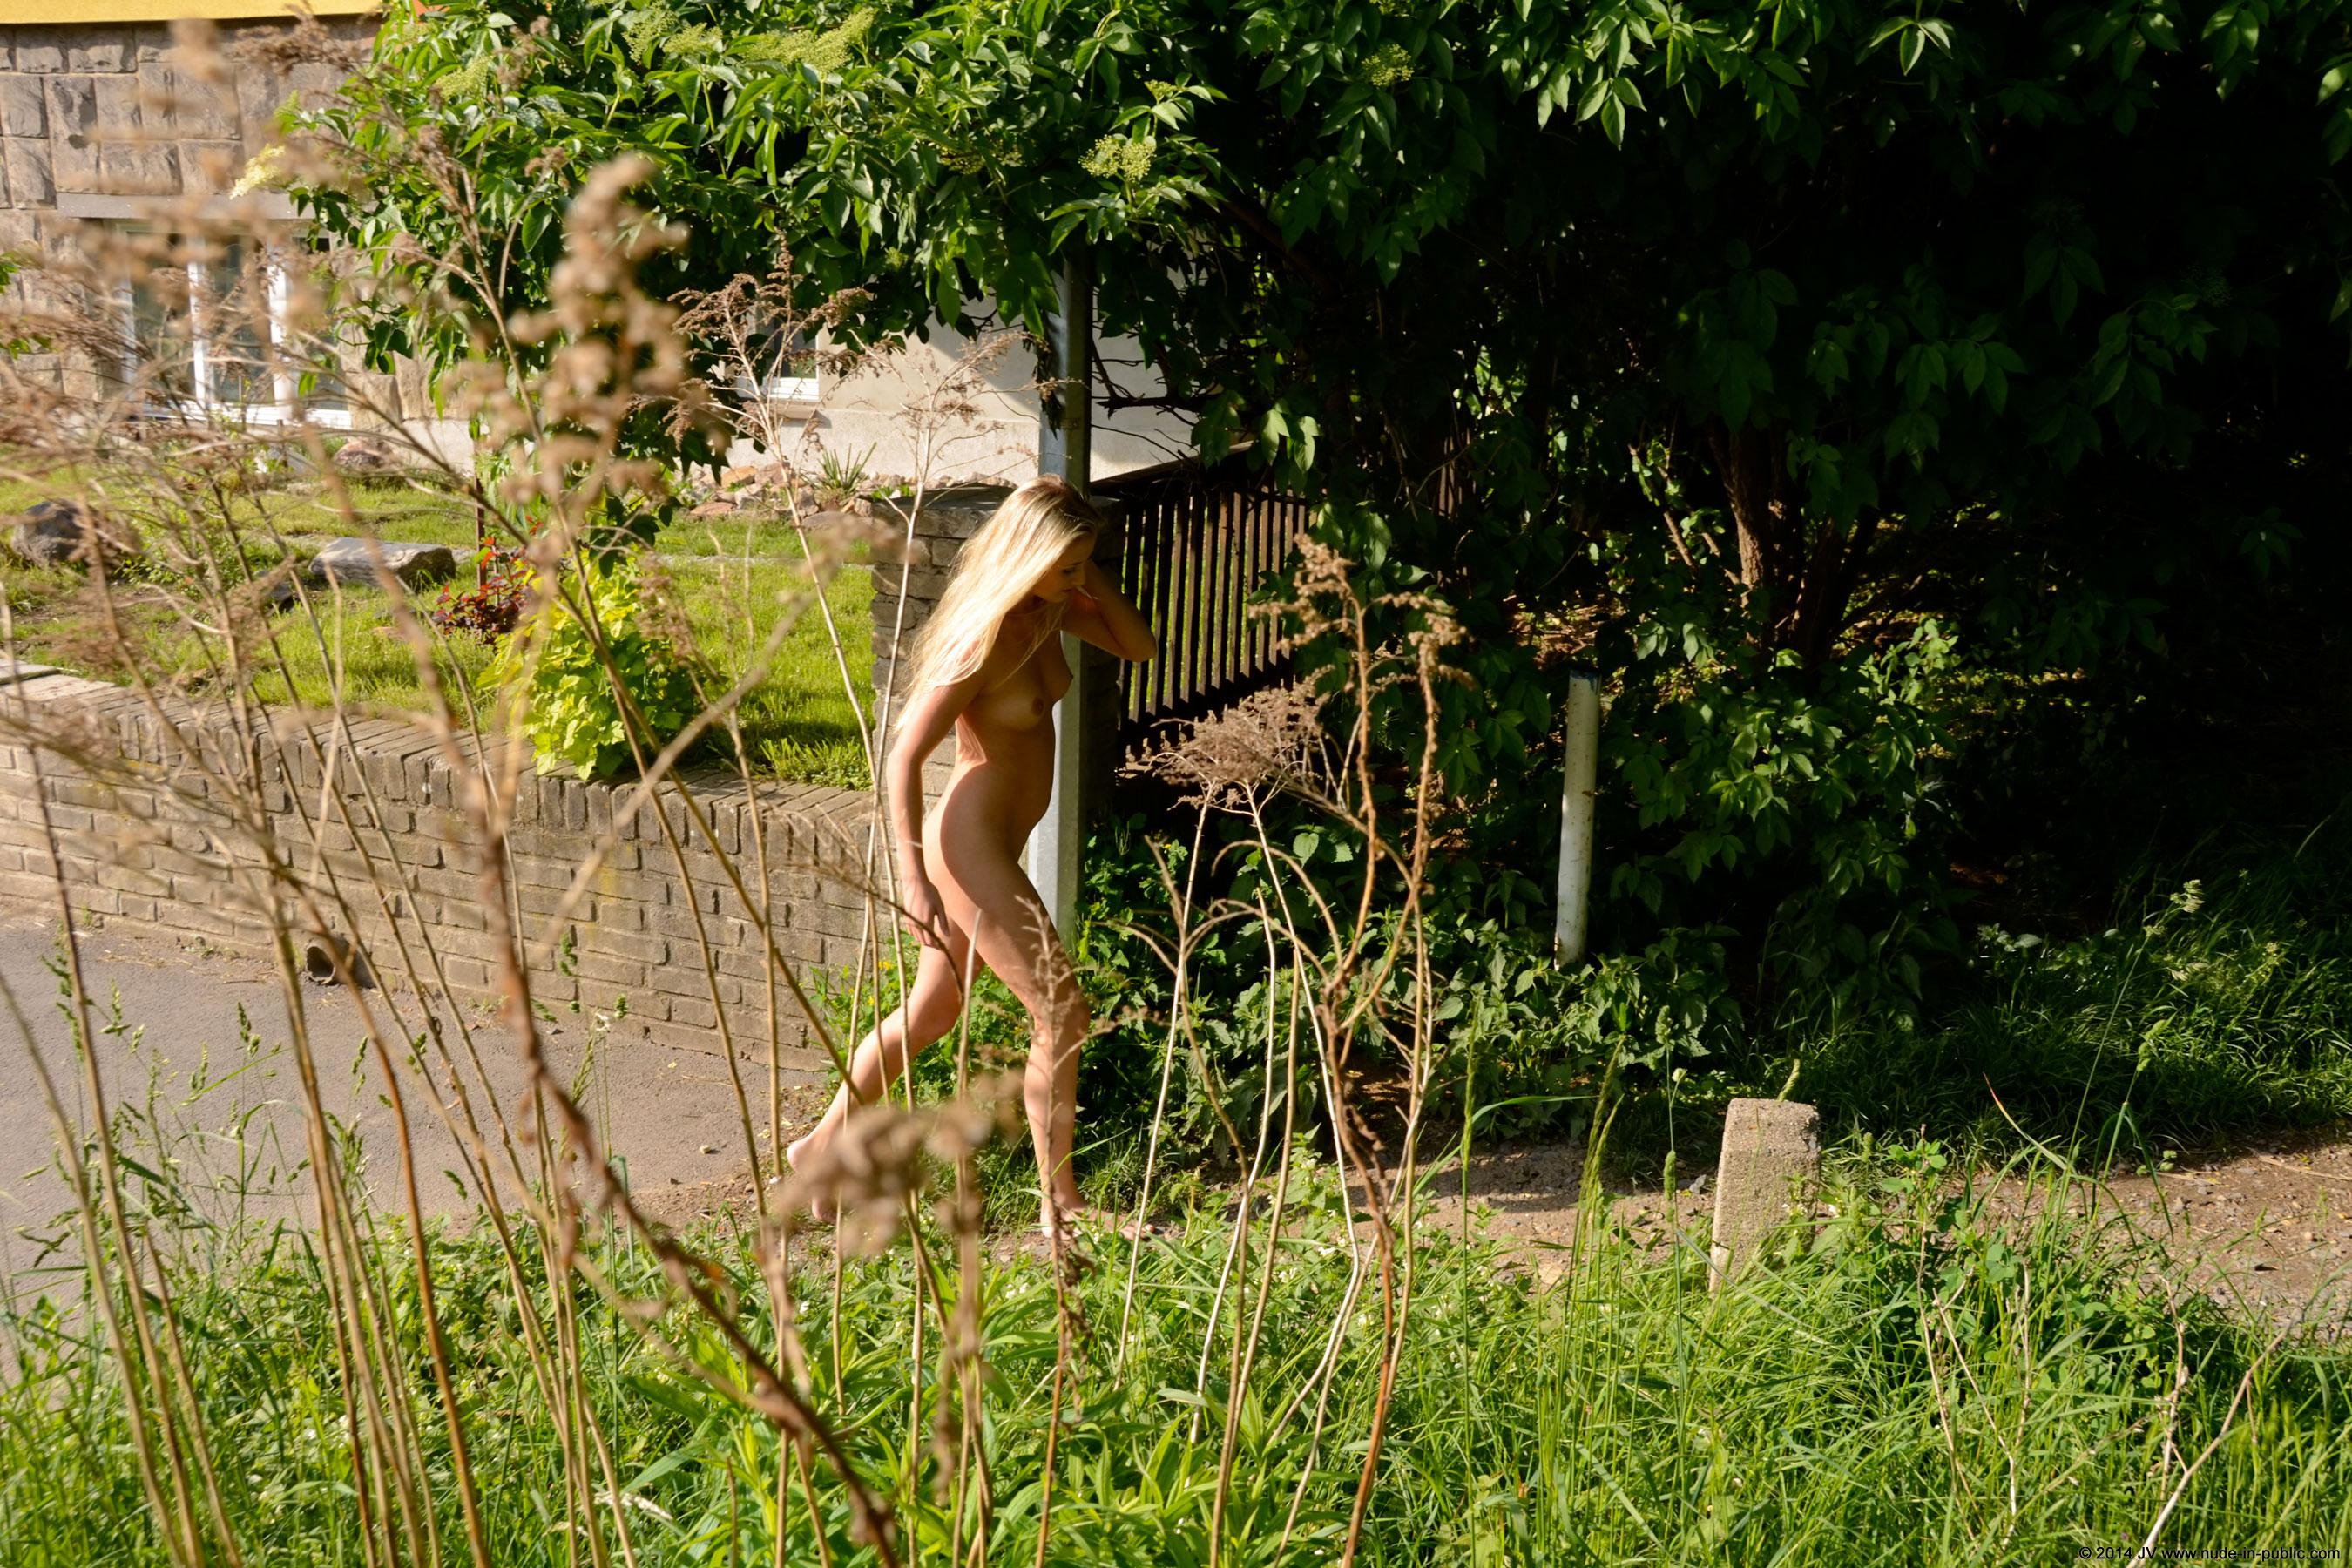 karolina-m-blonde-on-the-street-nude-in-public-15